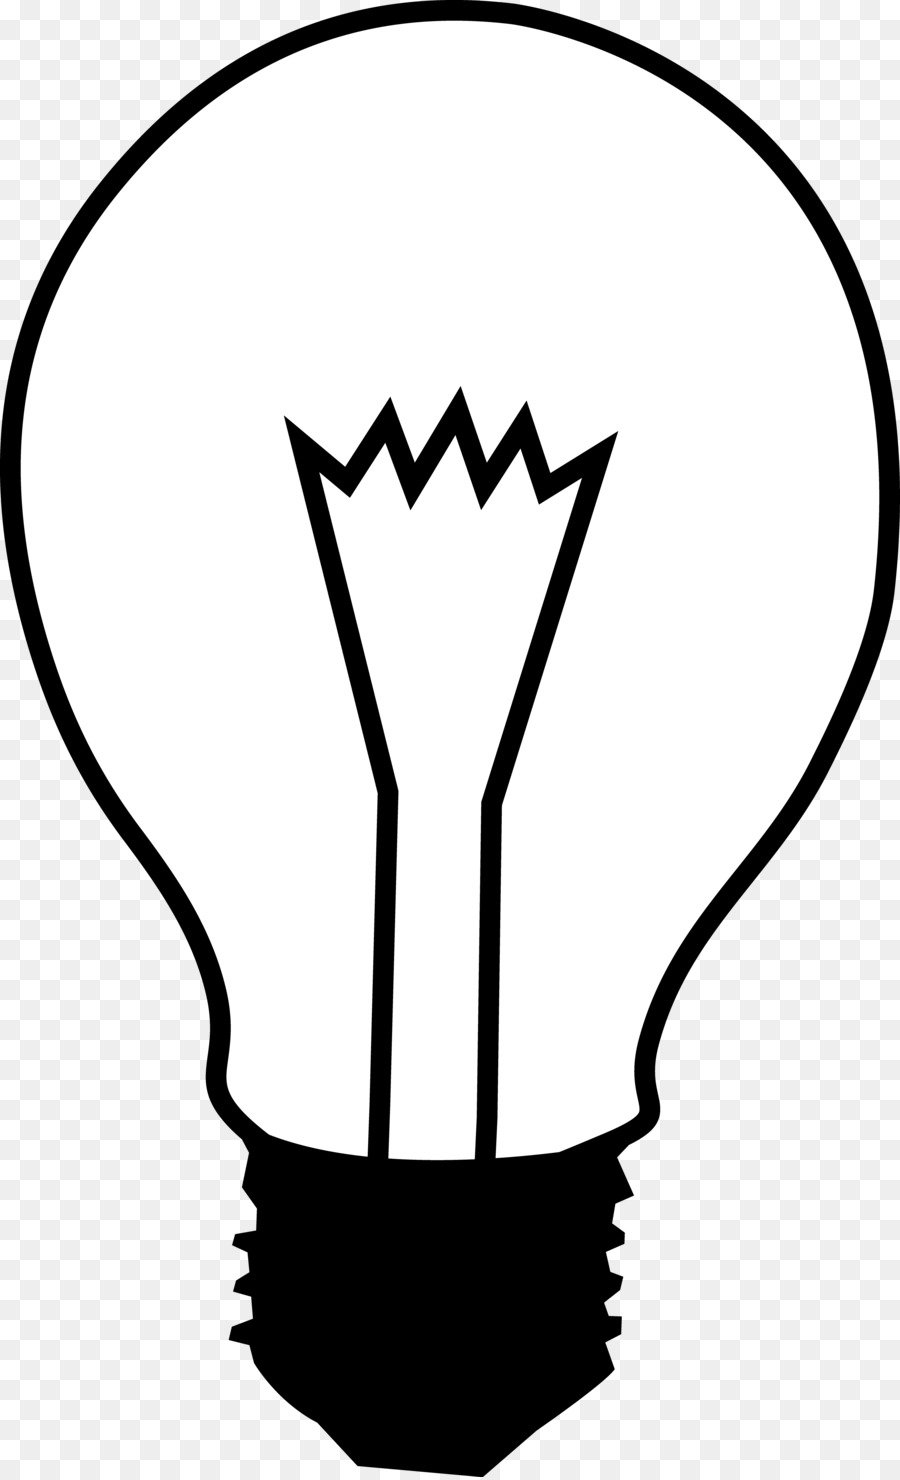 Incandescent light bulb electric light white clip art electric incandescent light bulb electric light white clip art electric lamp cliparts publicscrutiny Images